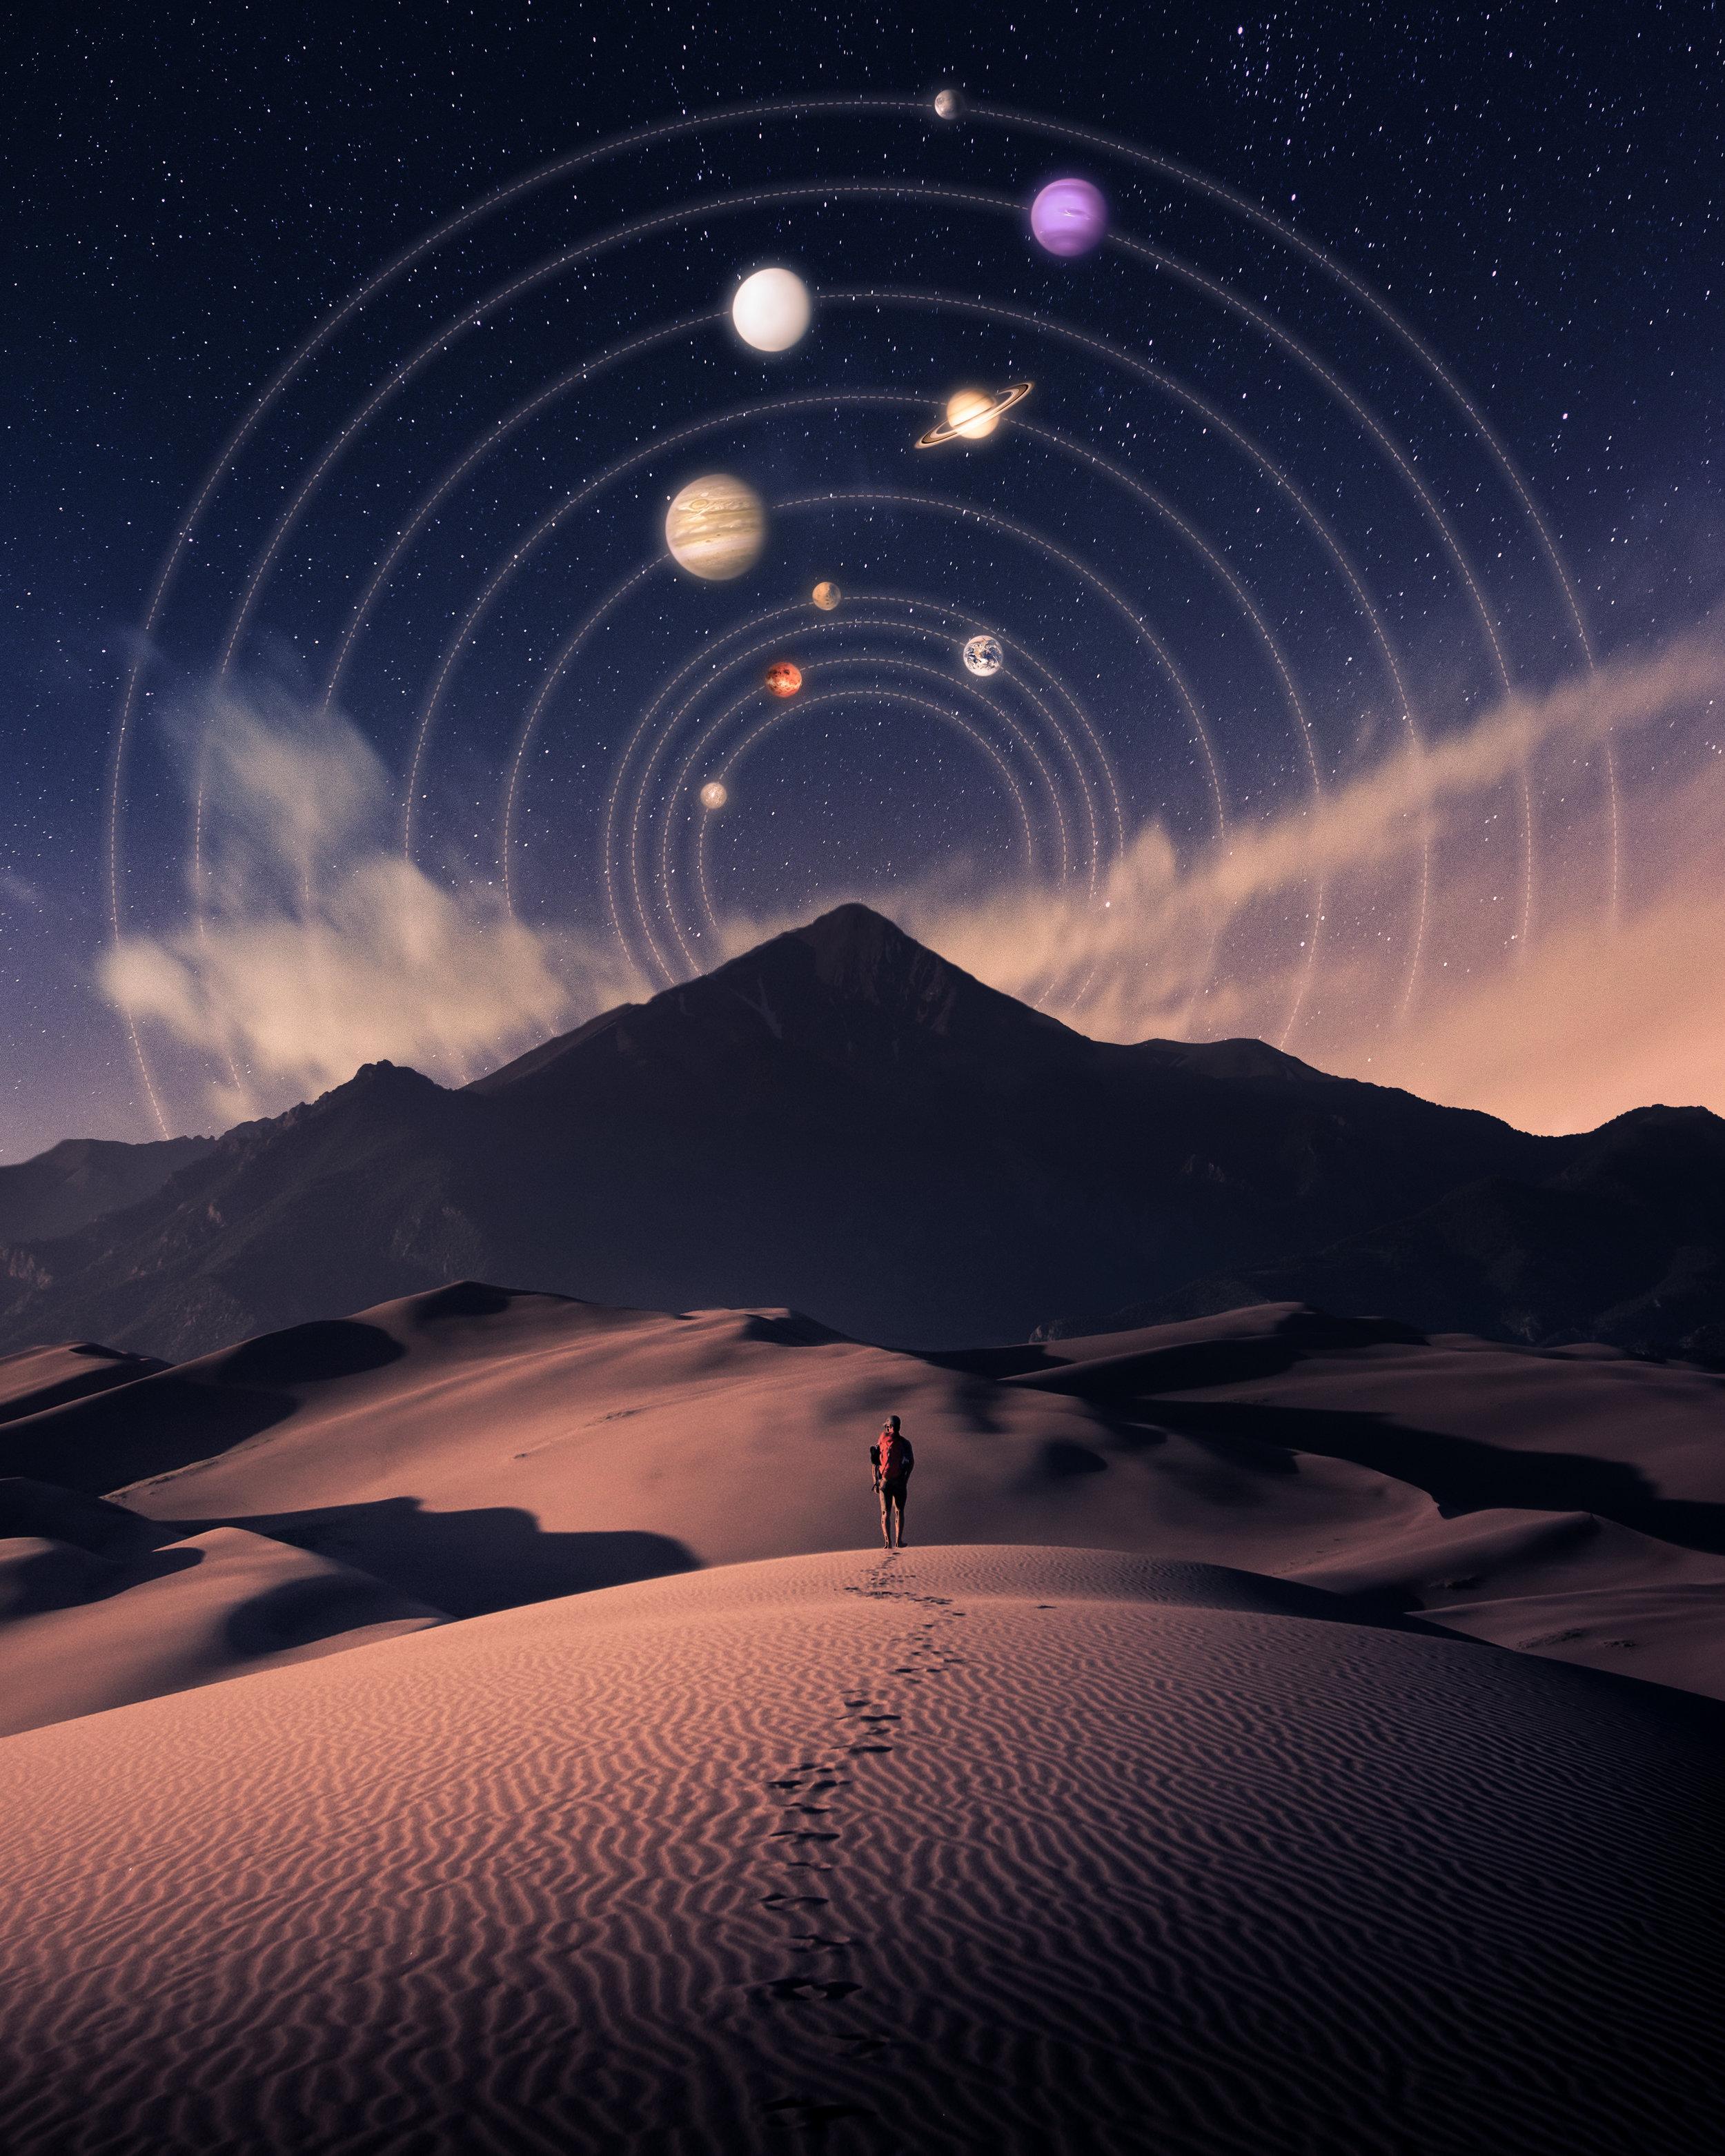 solarsystem.jpg